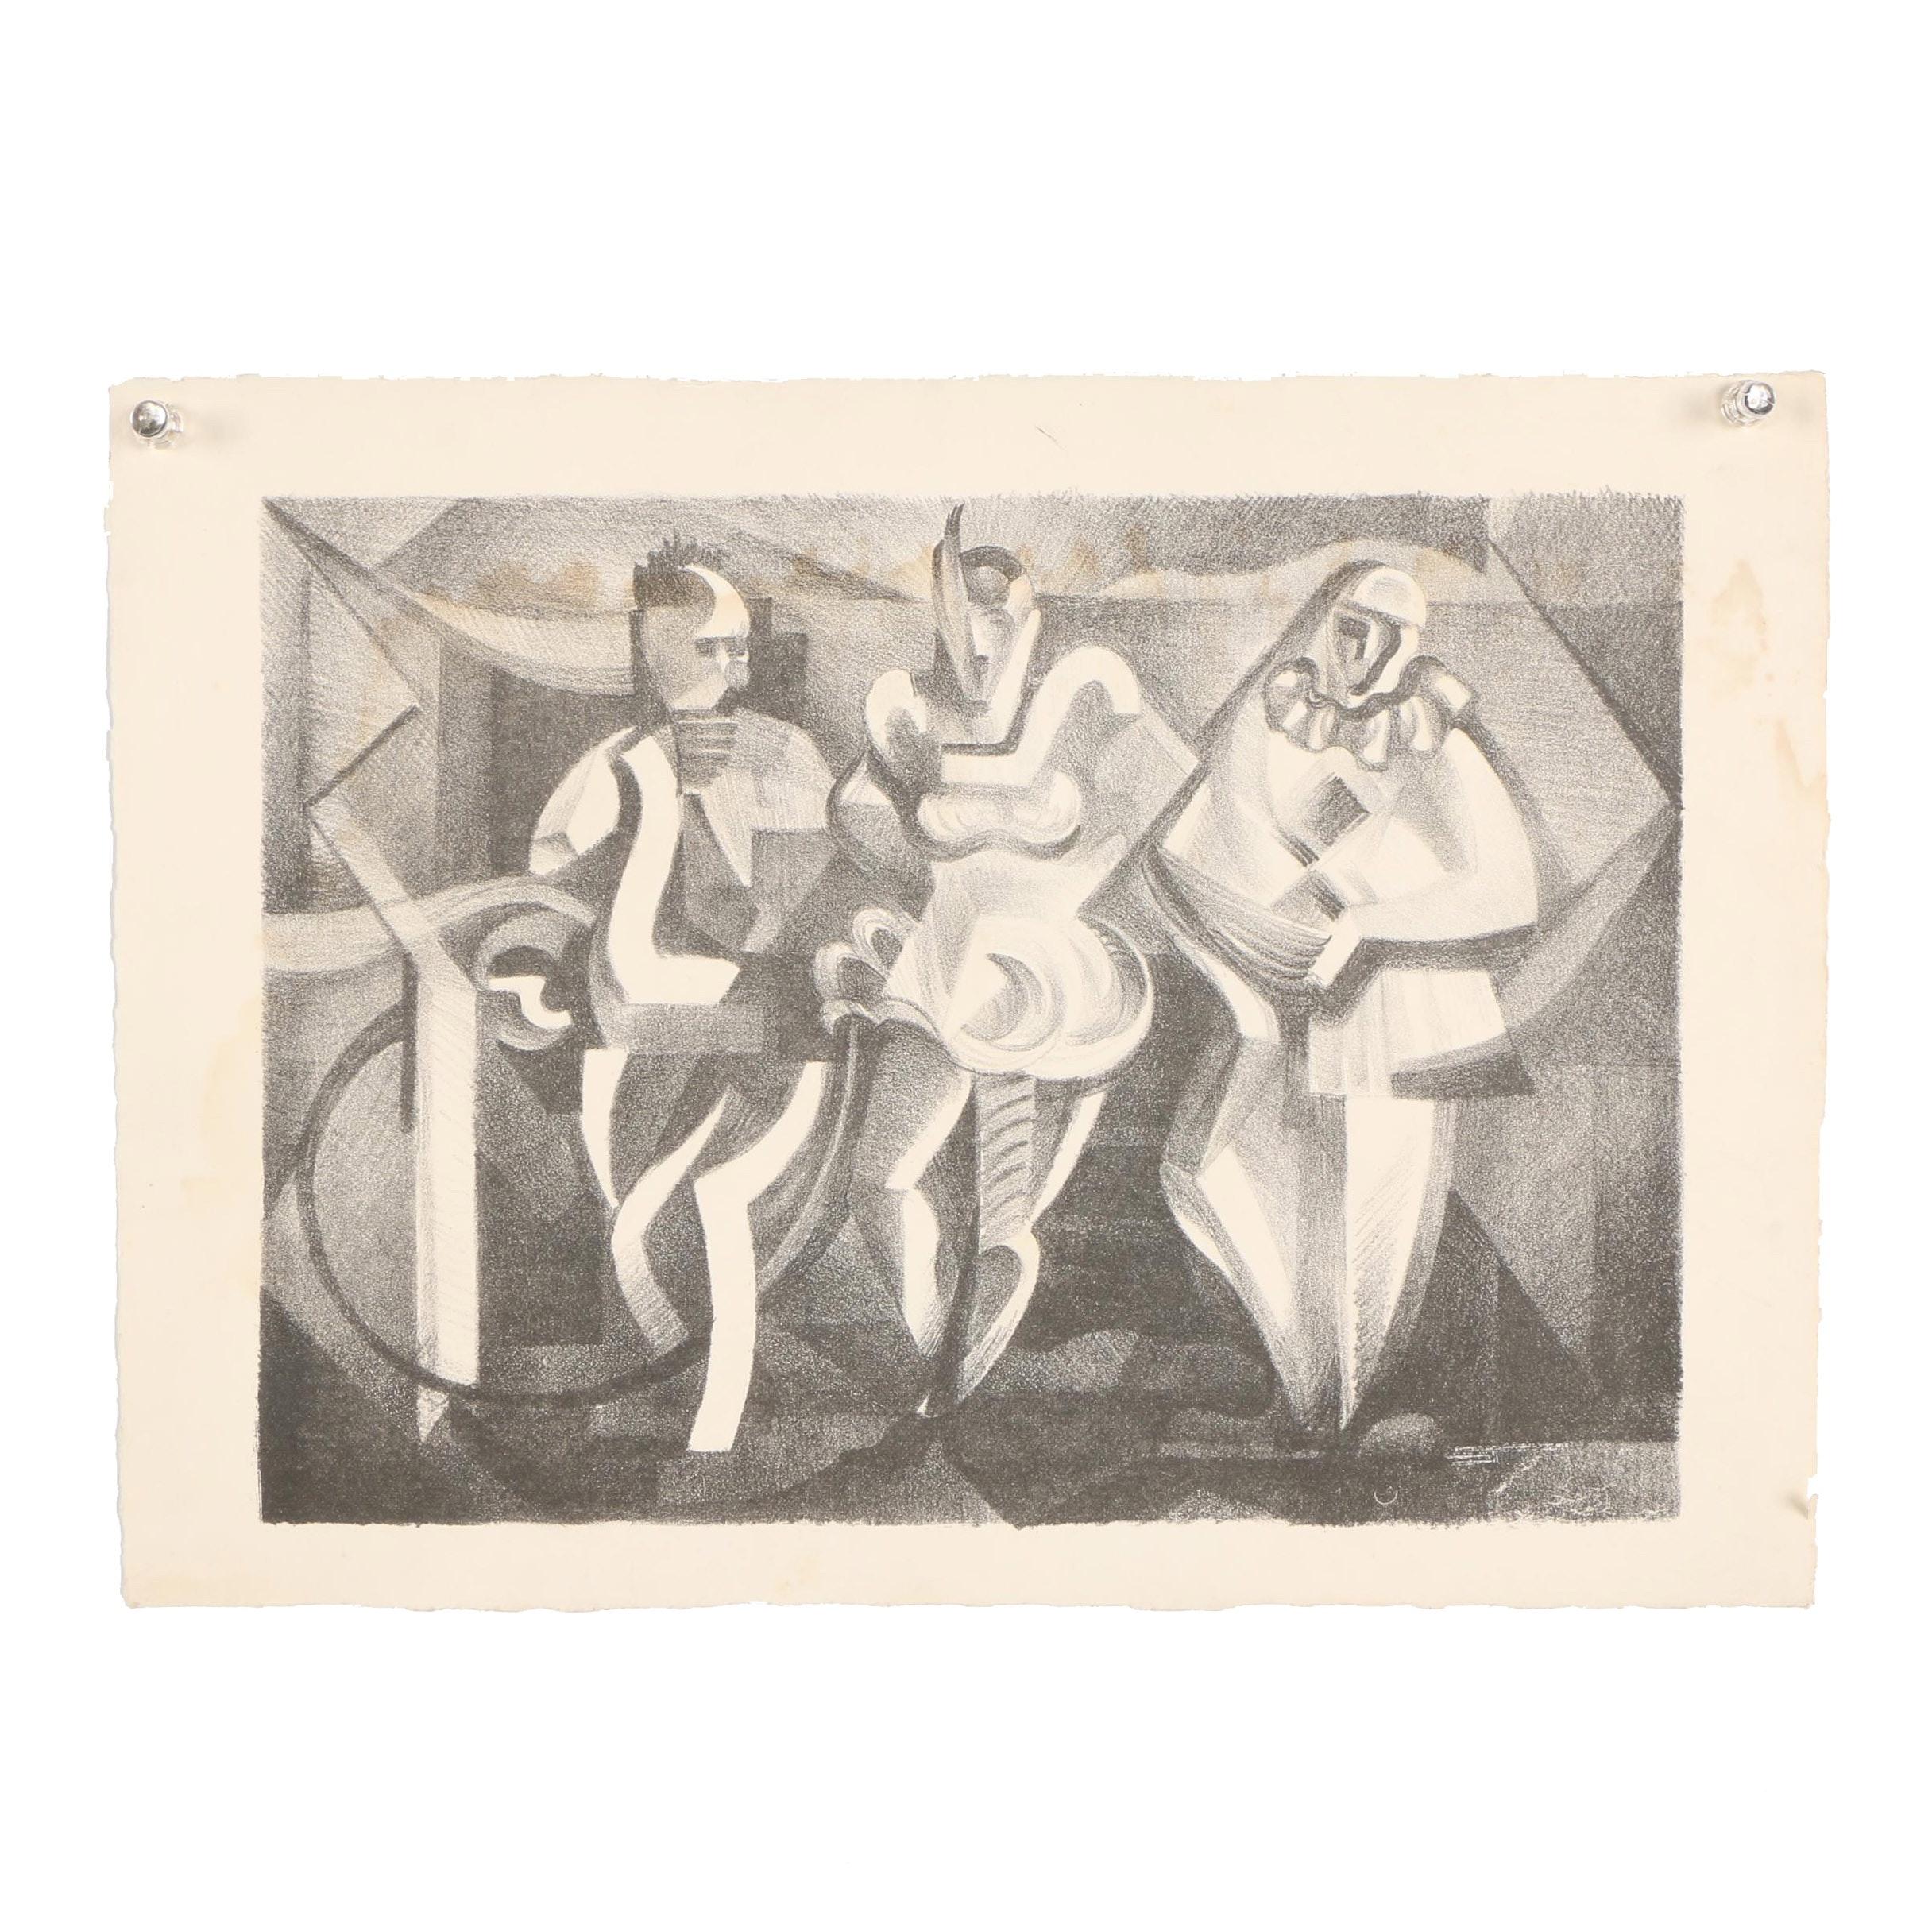 Arthur Helwig 20th Century Lithograph